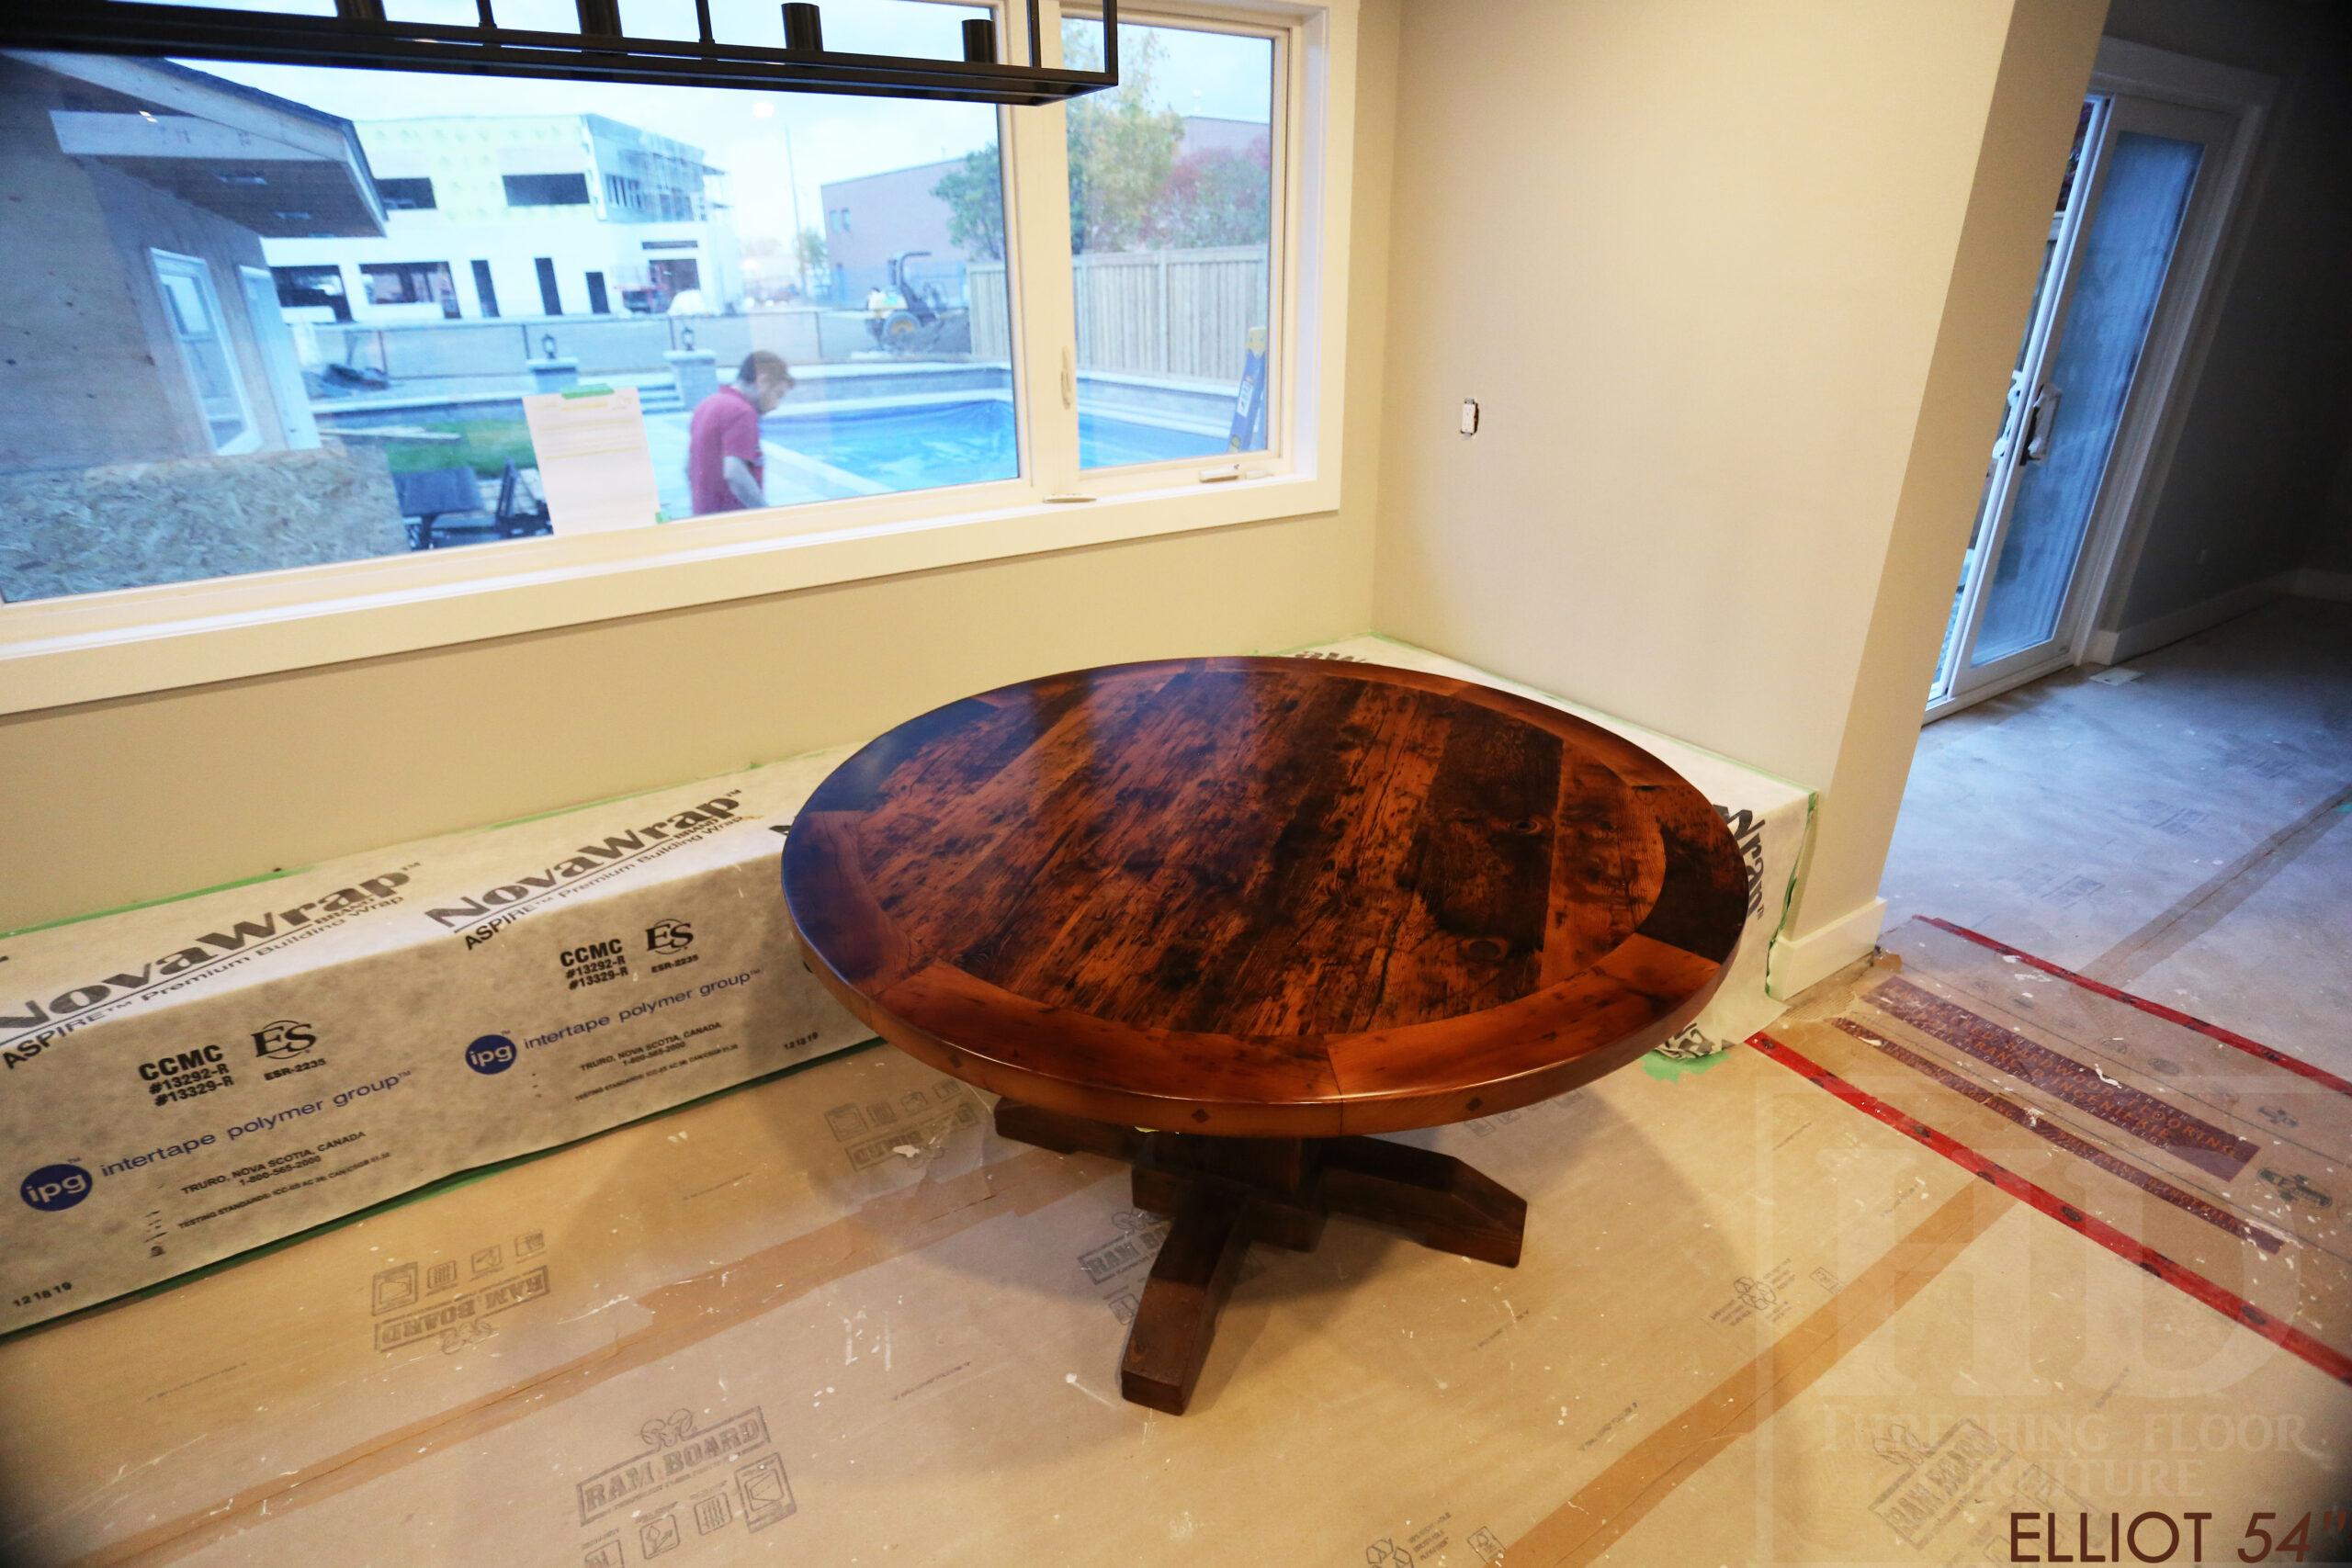 "54"" Ontario Barnwood Round Table we made for a Milton home - 2"" Hemlock Threshing Floor Top - Hand Hewn Beam Pedestal Base - Original edges & distressing maintained - Premium epoxy + matte polyurethane finish - www.table.ca"